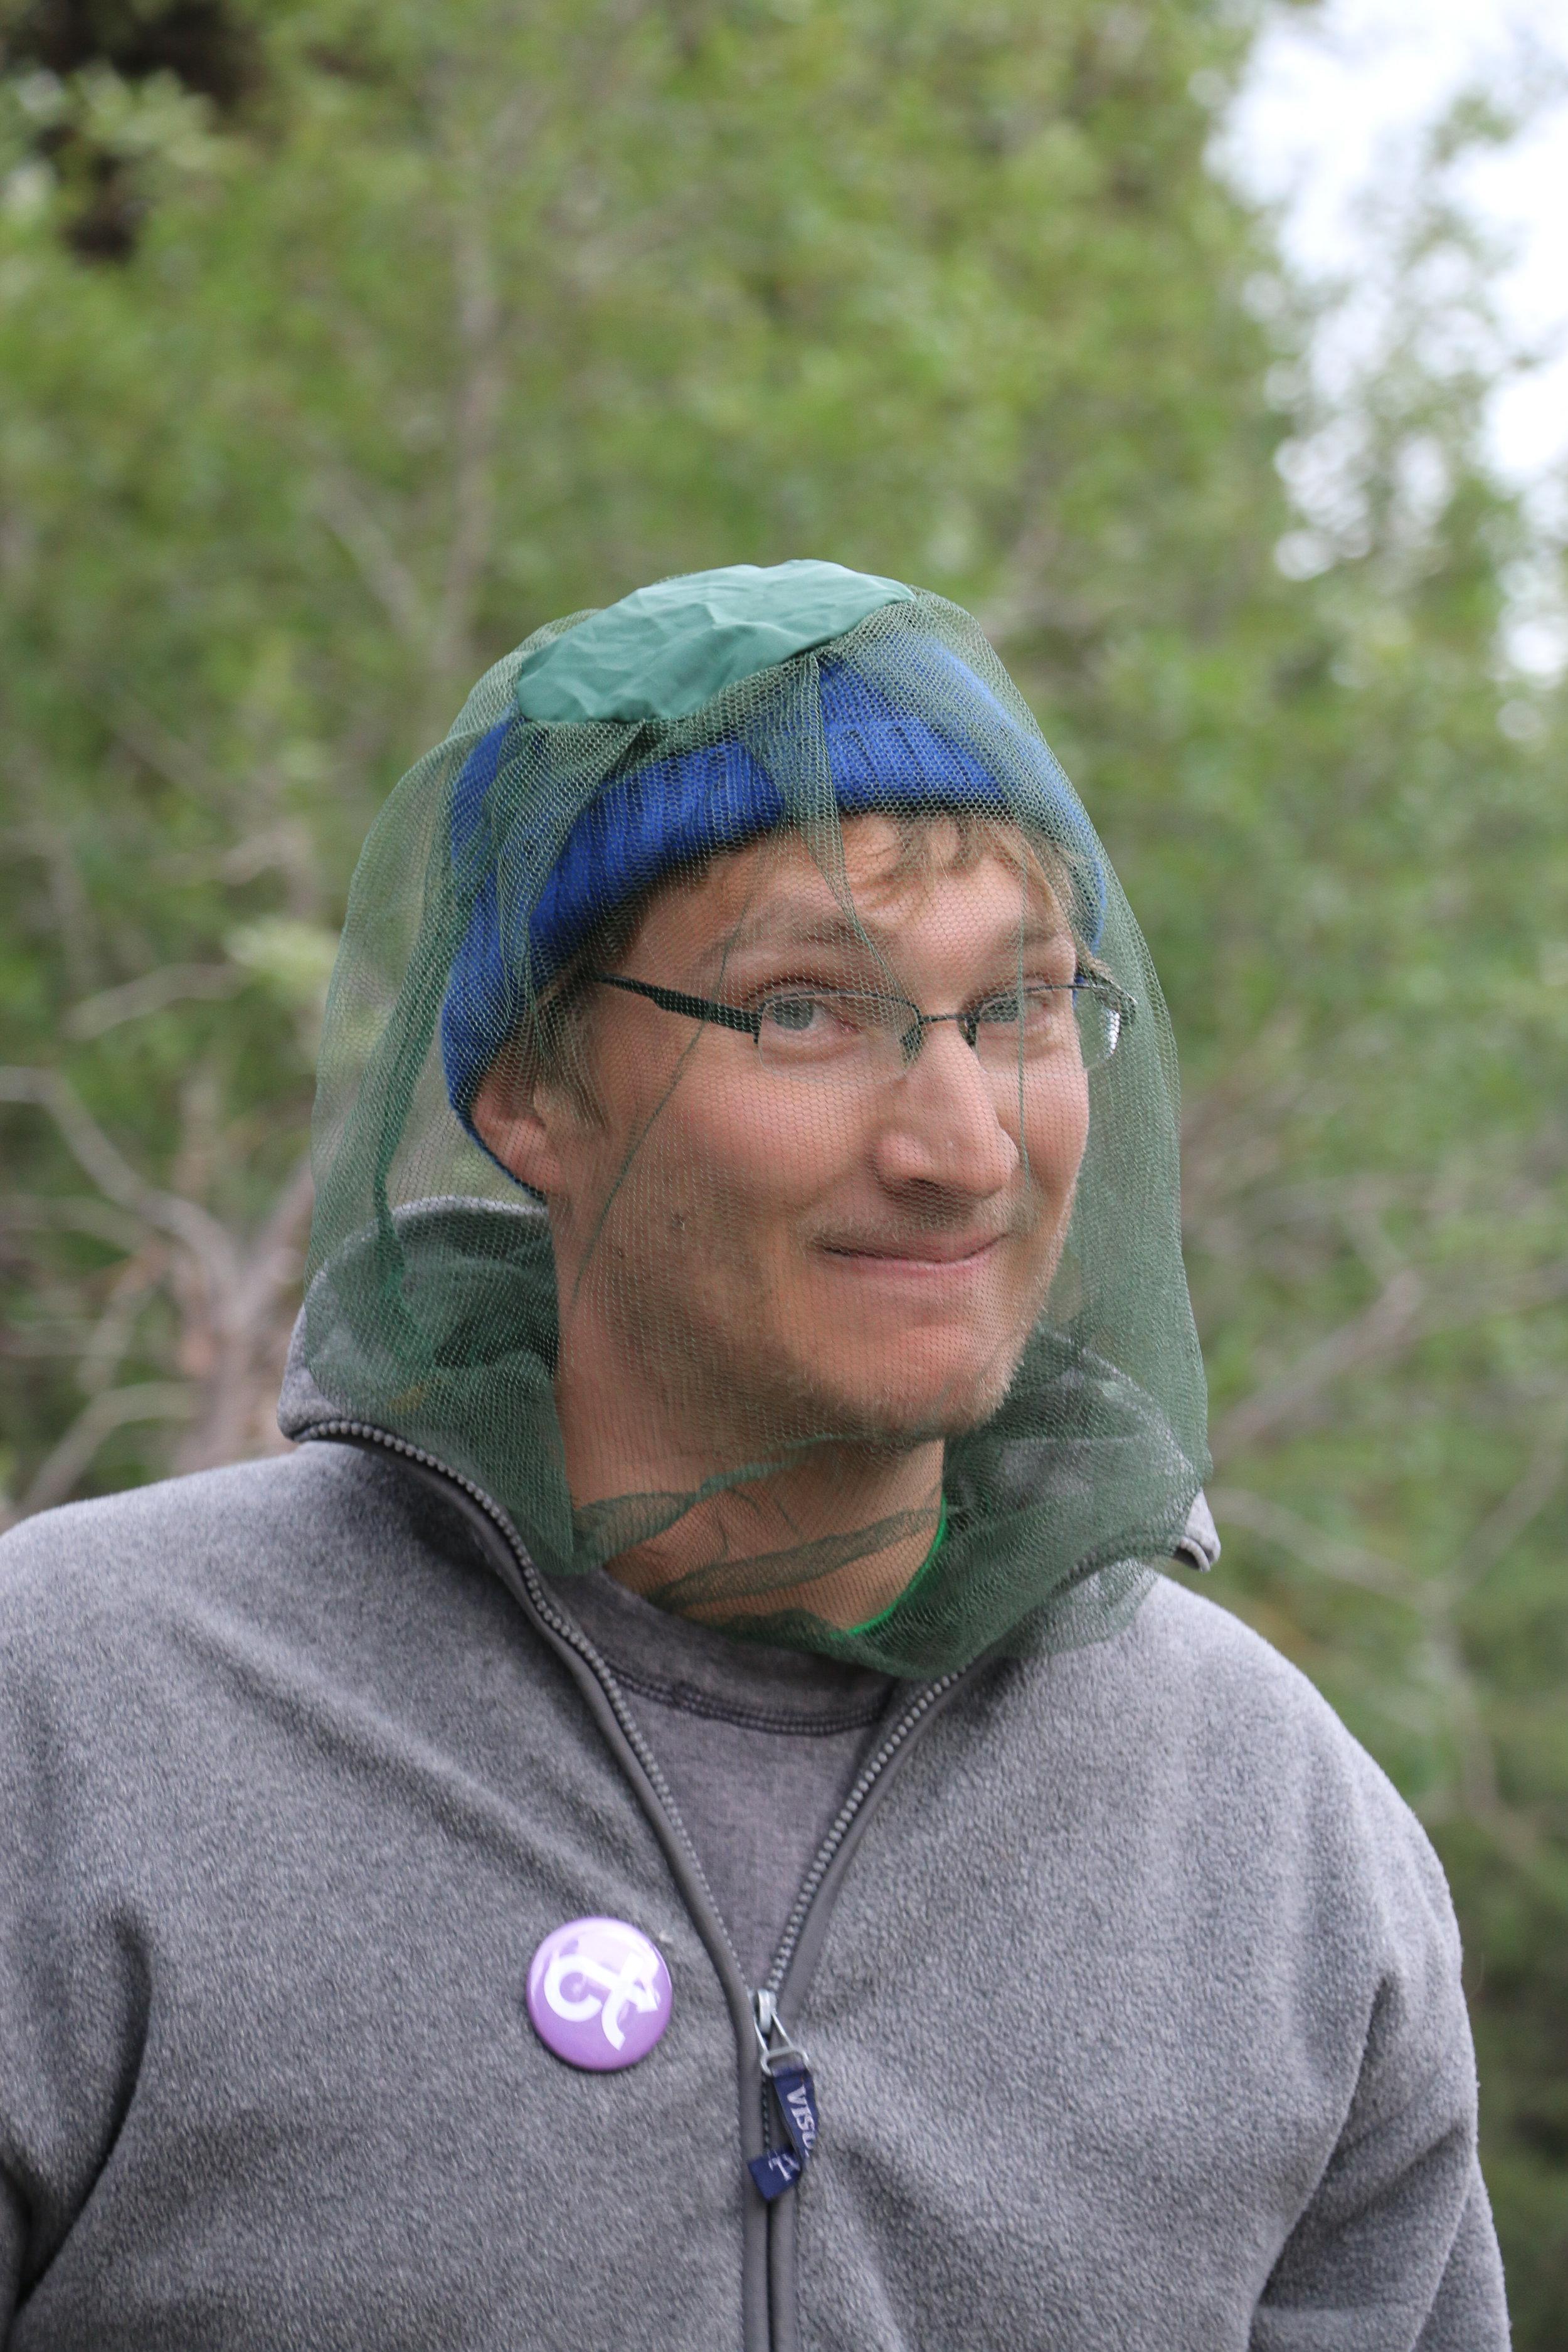 2014 participant Marc Evans was a big fan of the headnet.